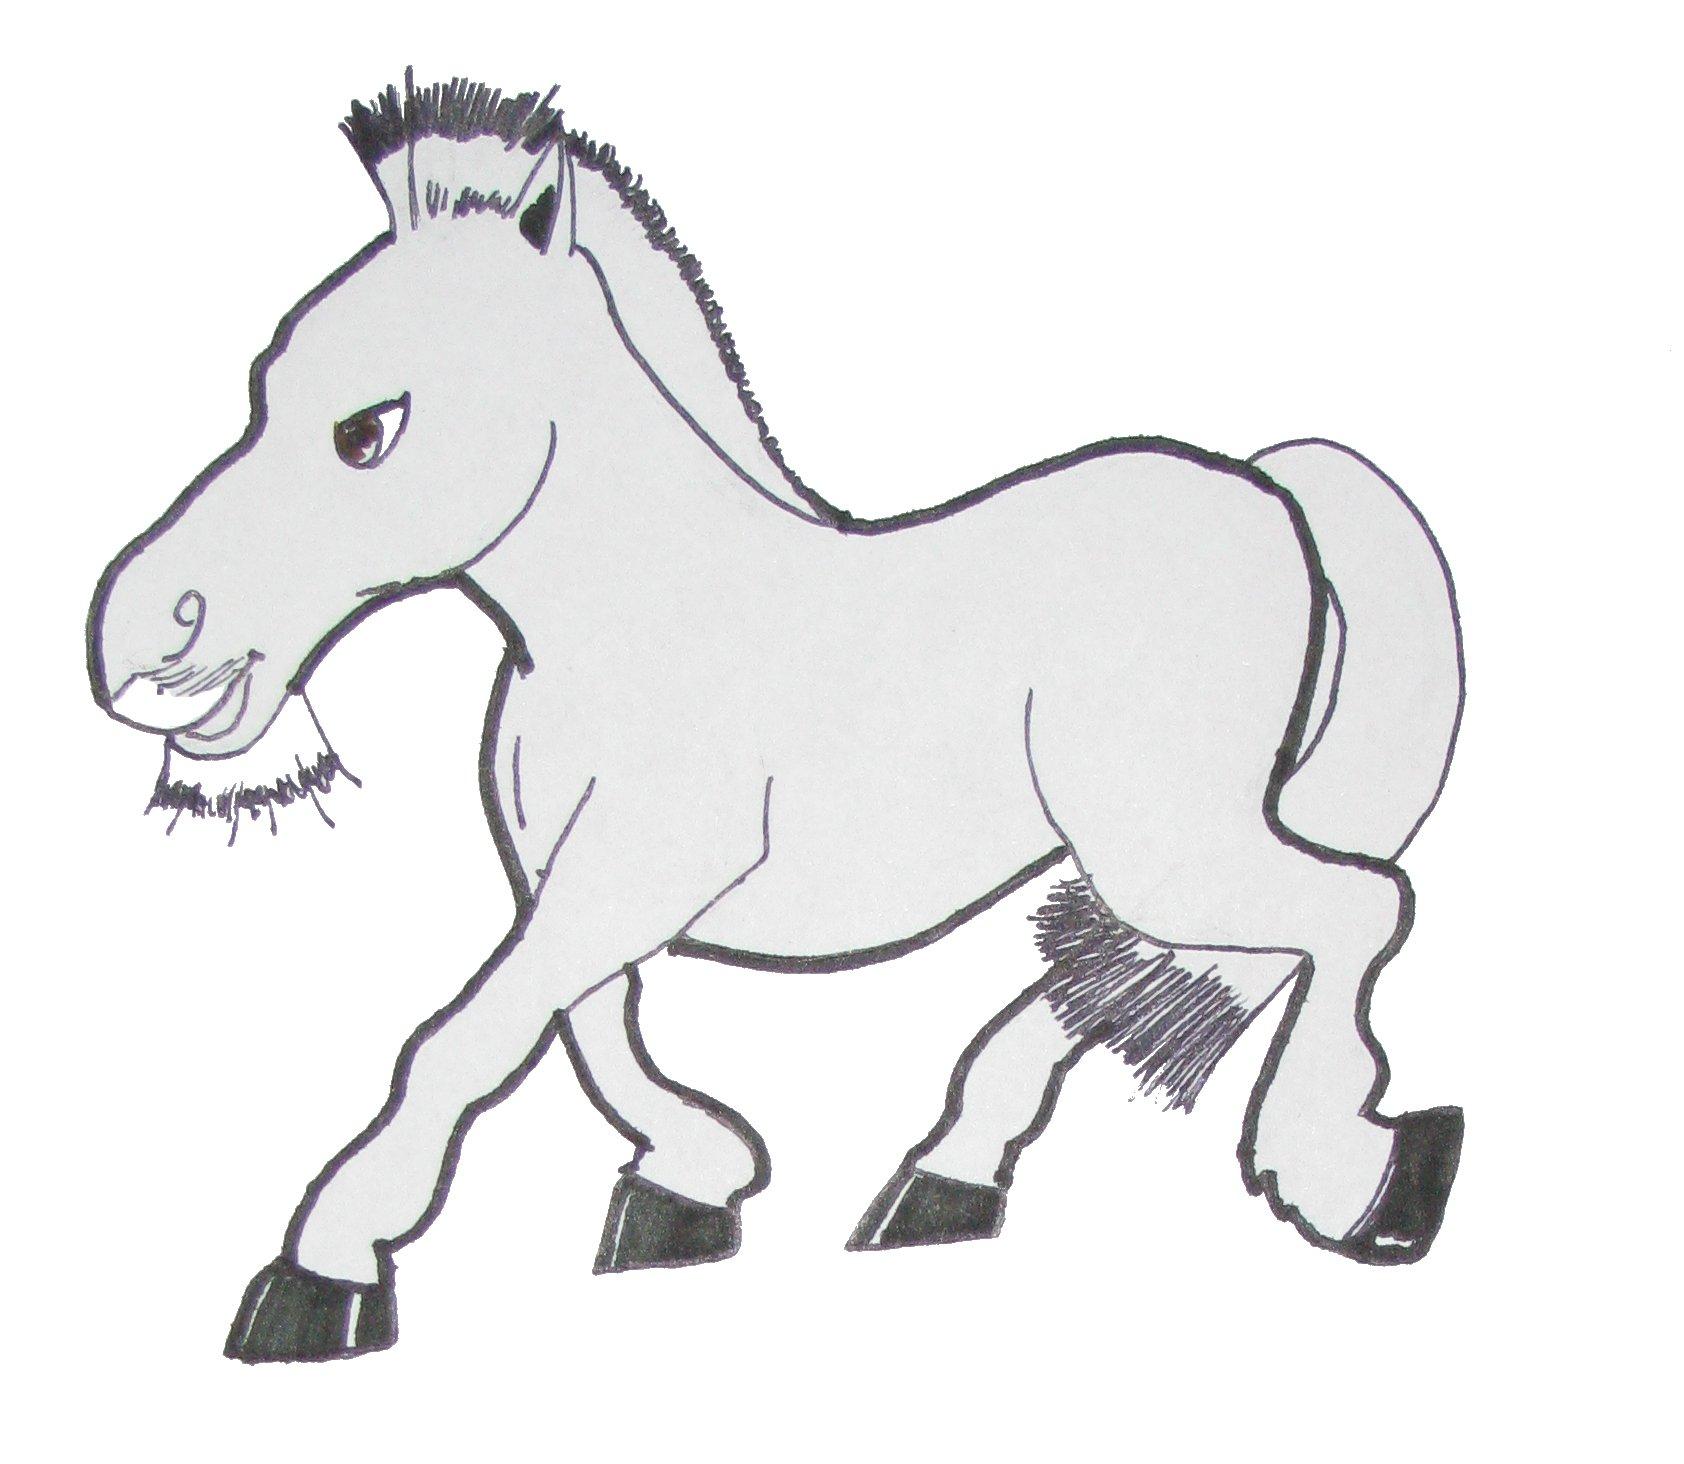 prz cheval